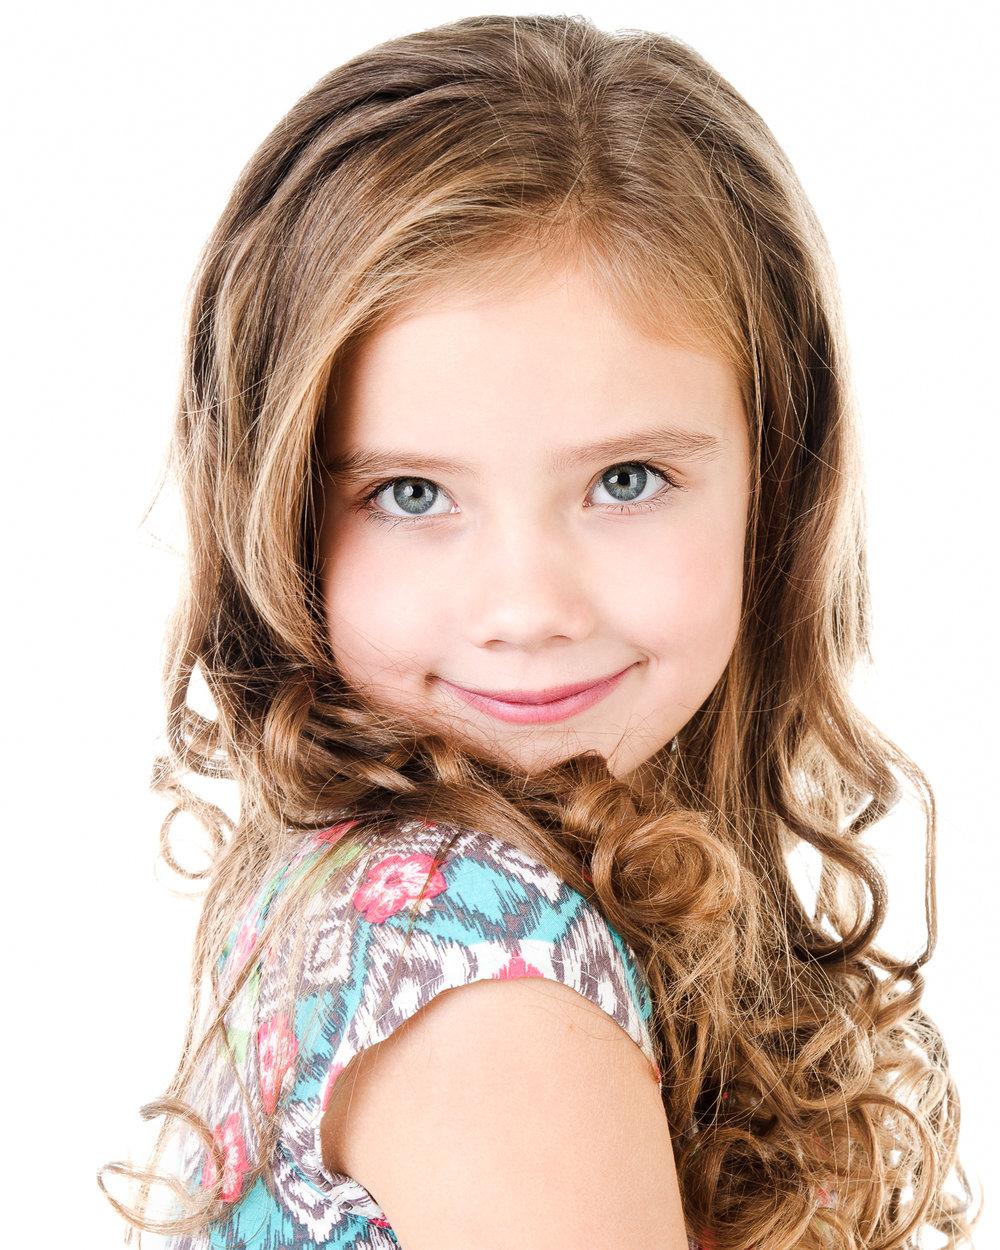 Kids Photography Portraits